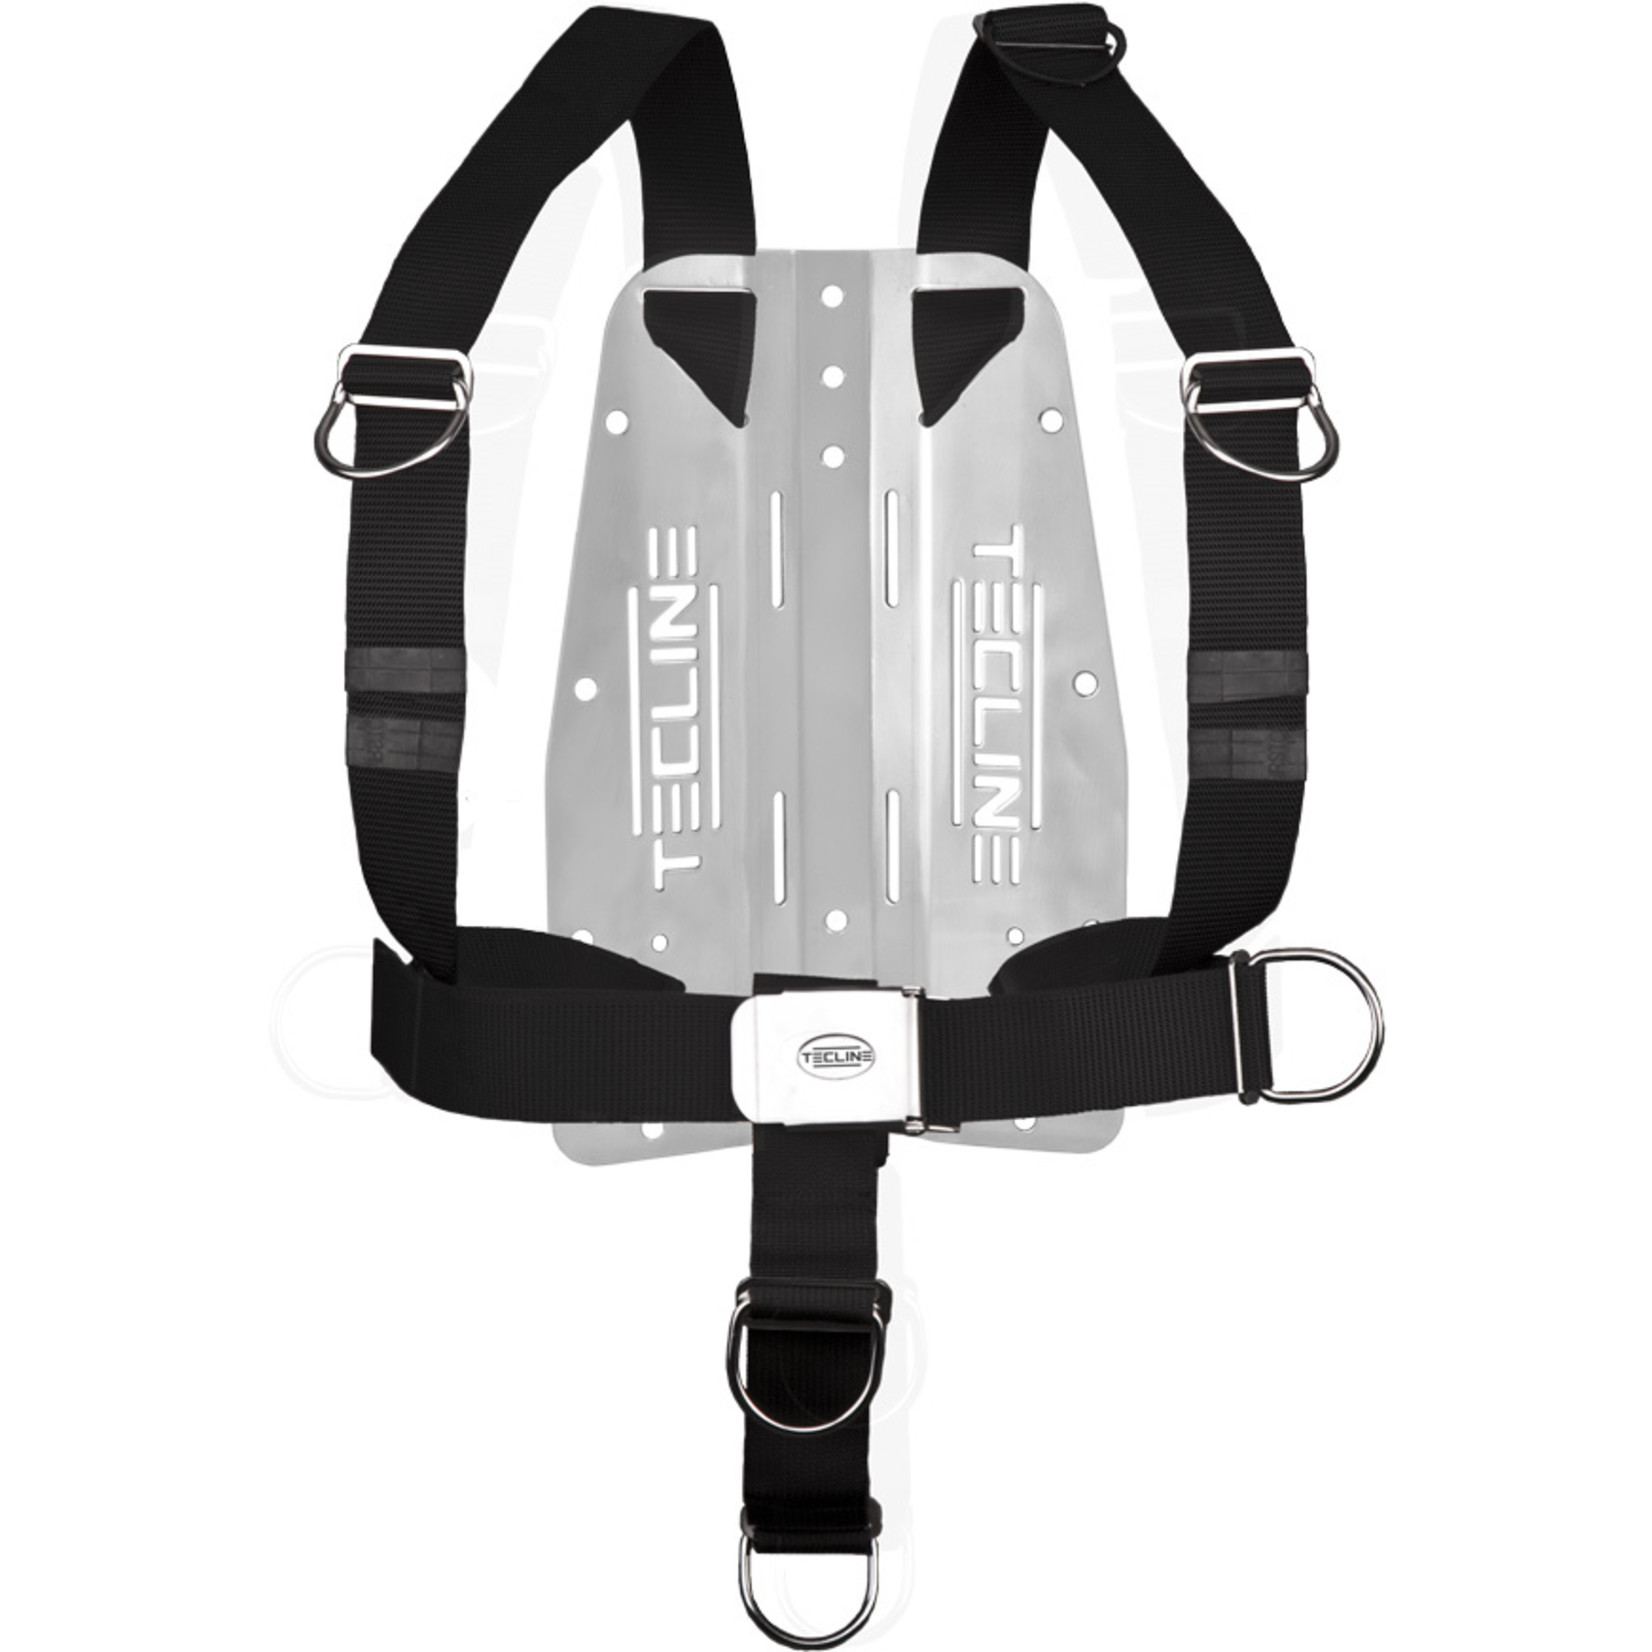 Tecline Harness TecLine DIR hard webbing - incl. 3mm RVS backplate